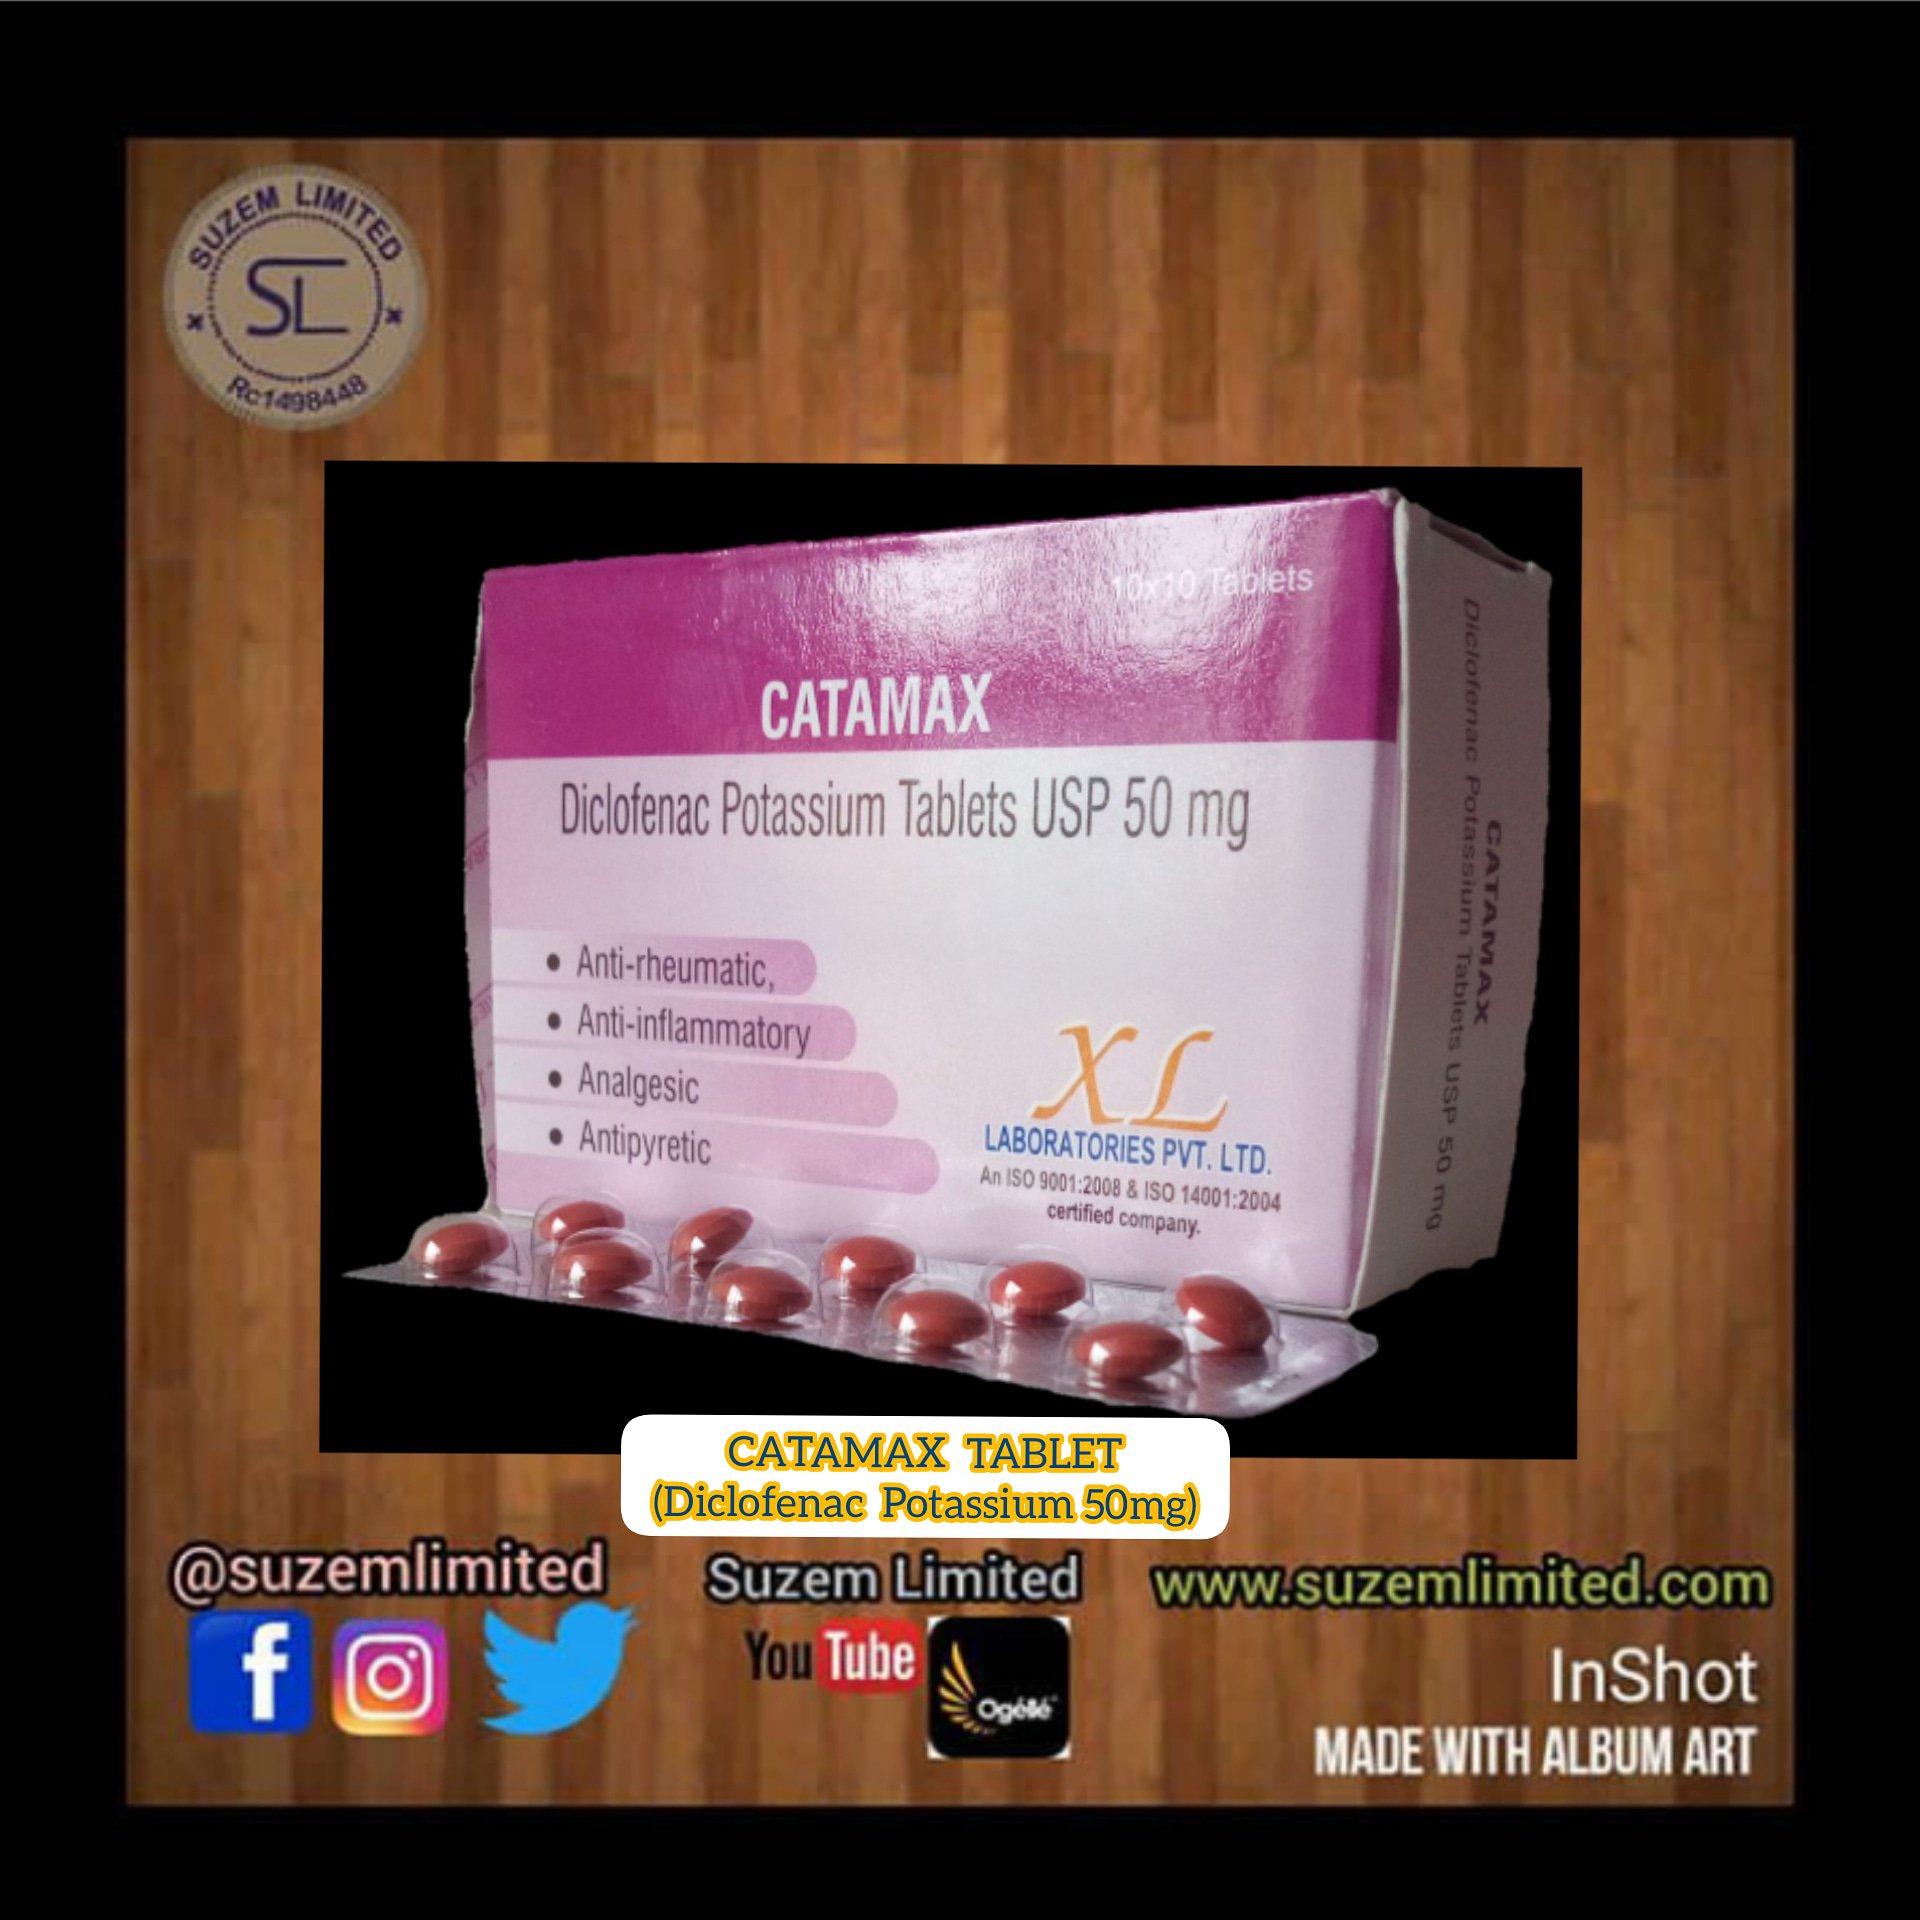 Suzem Limited On Twitter Catamax Diclofenac Potassium Usp 50mg Tablets 10 10 Https T Co 17ojadpami Suzem Wemakeitknown